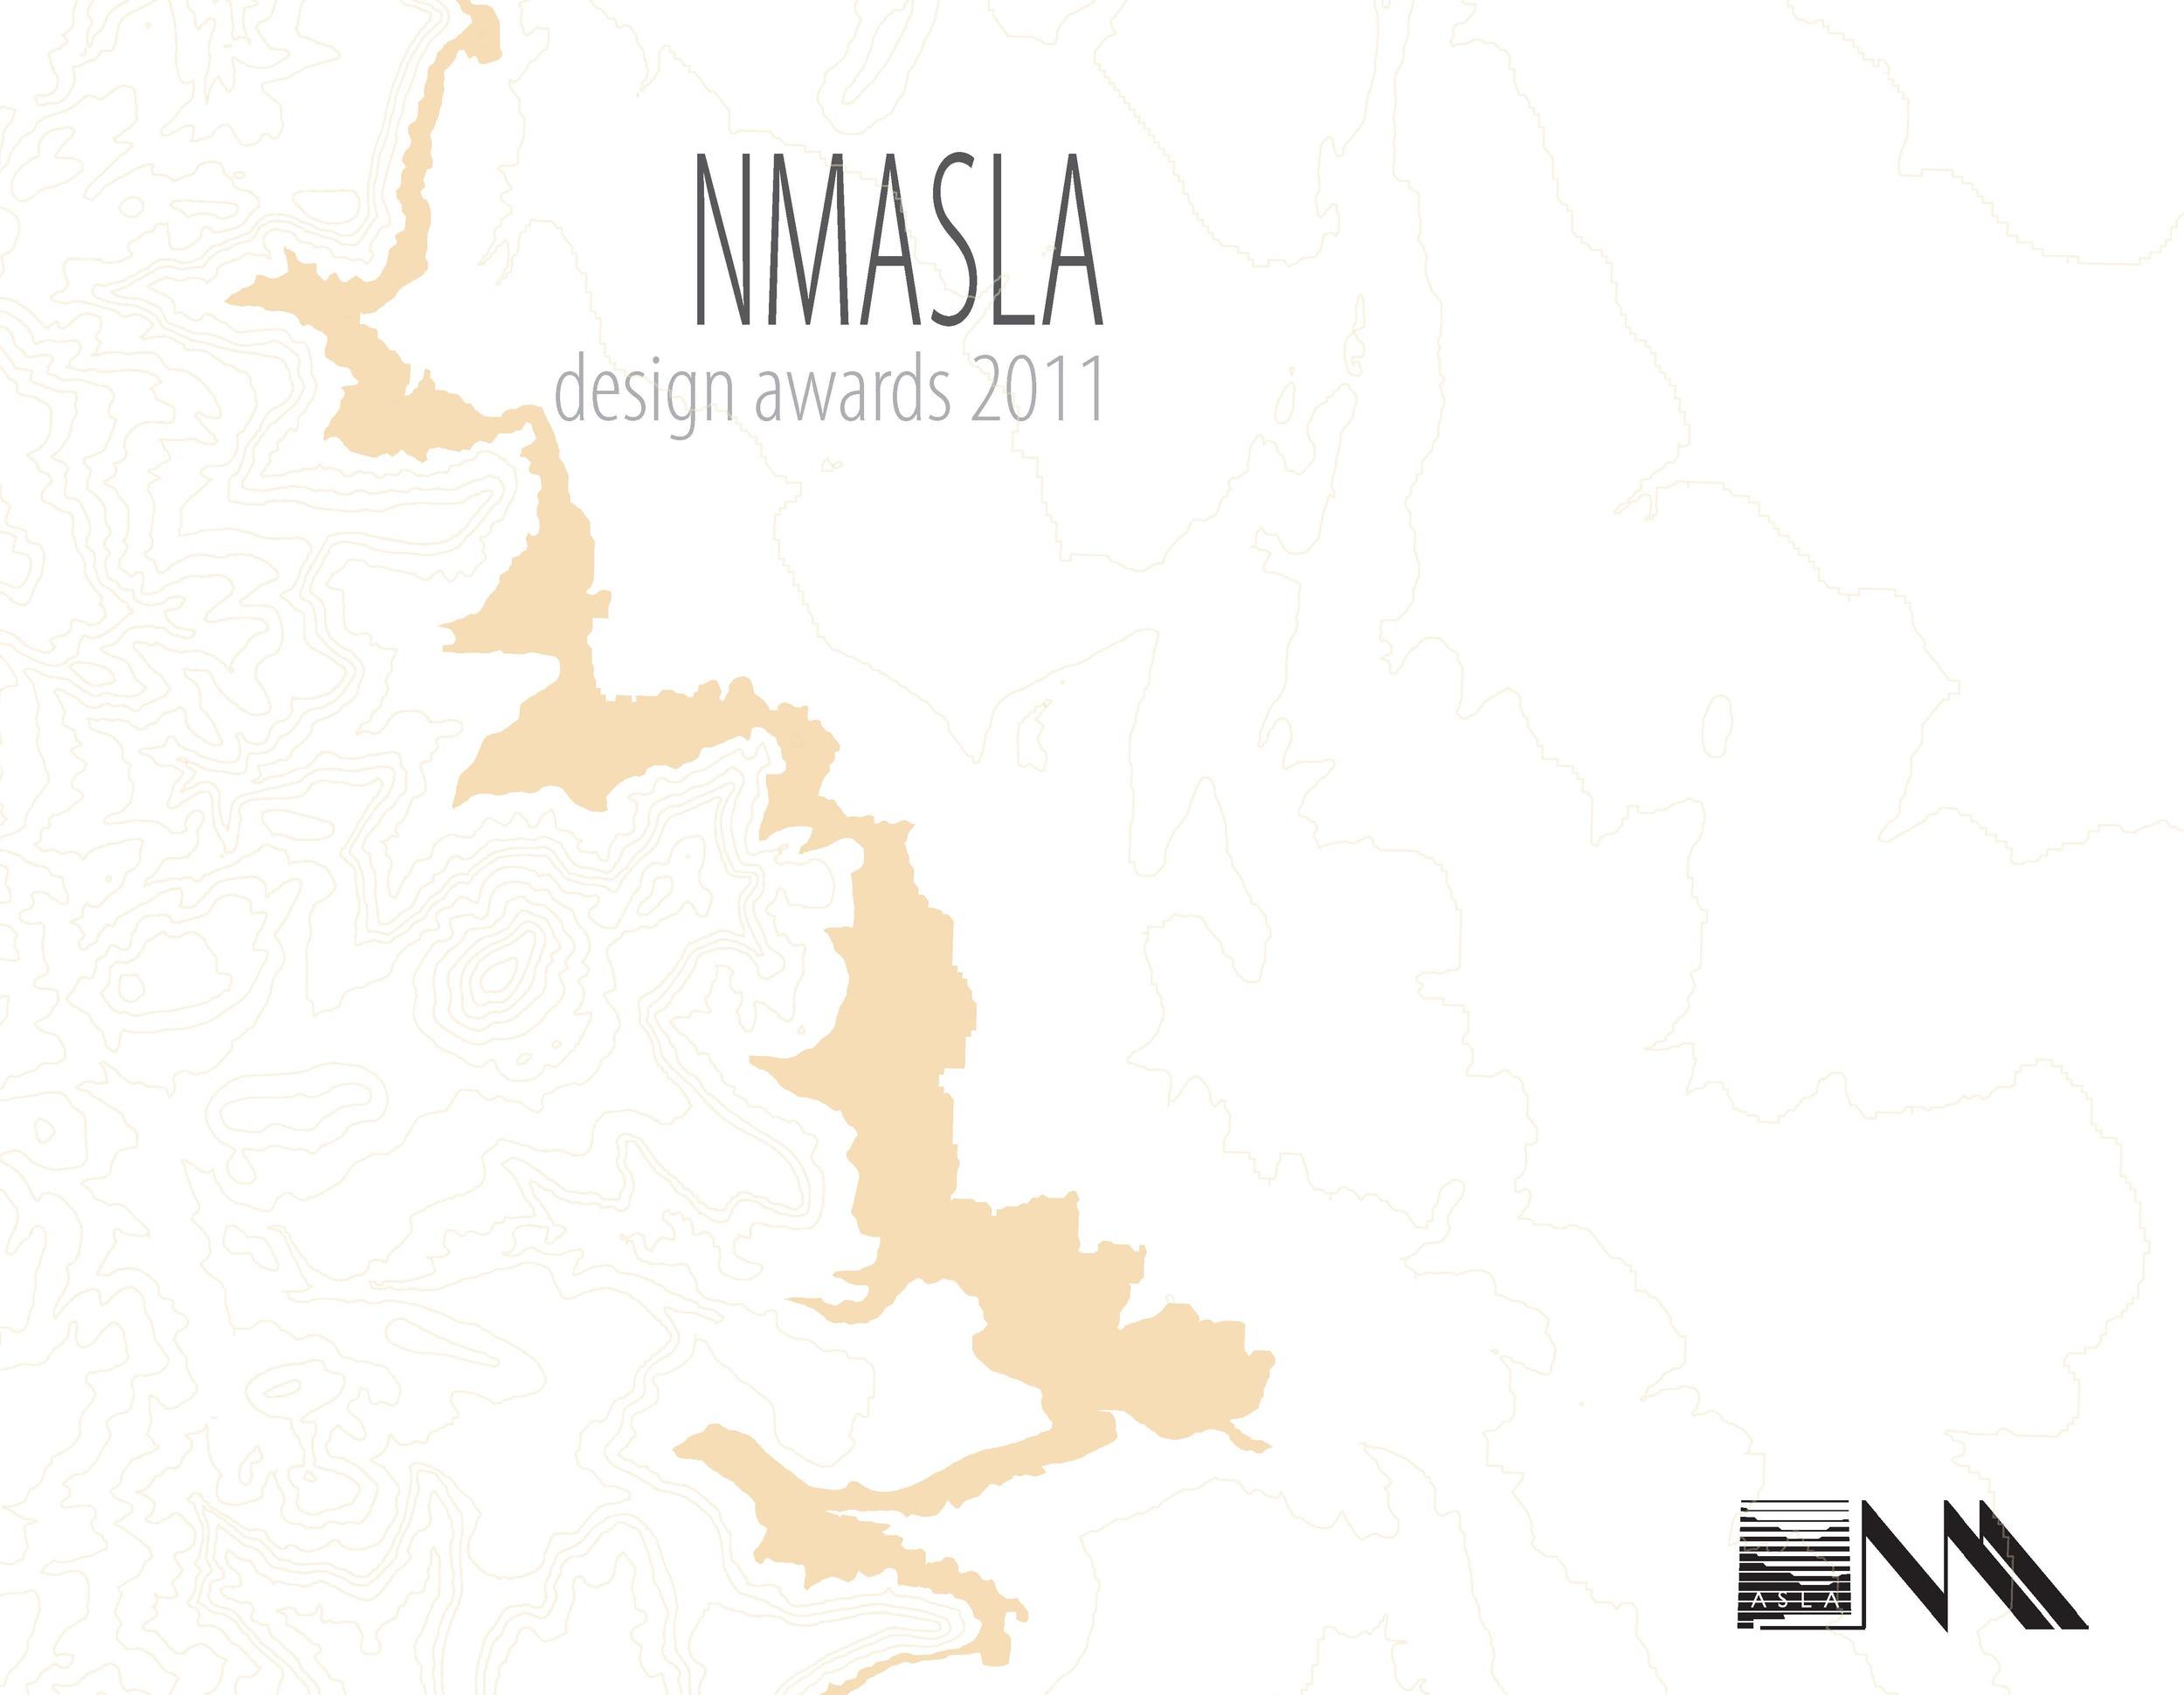 nmasla design awards book